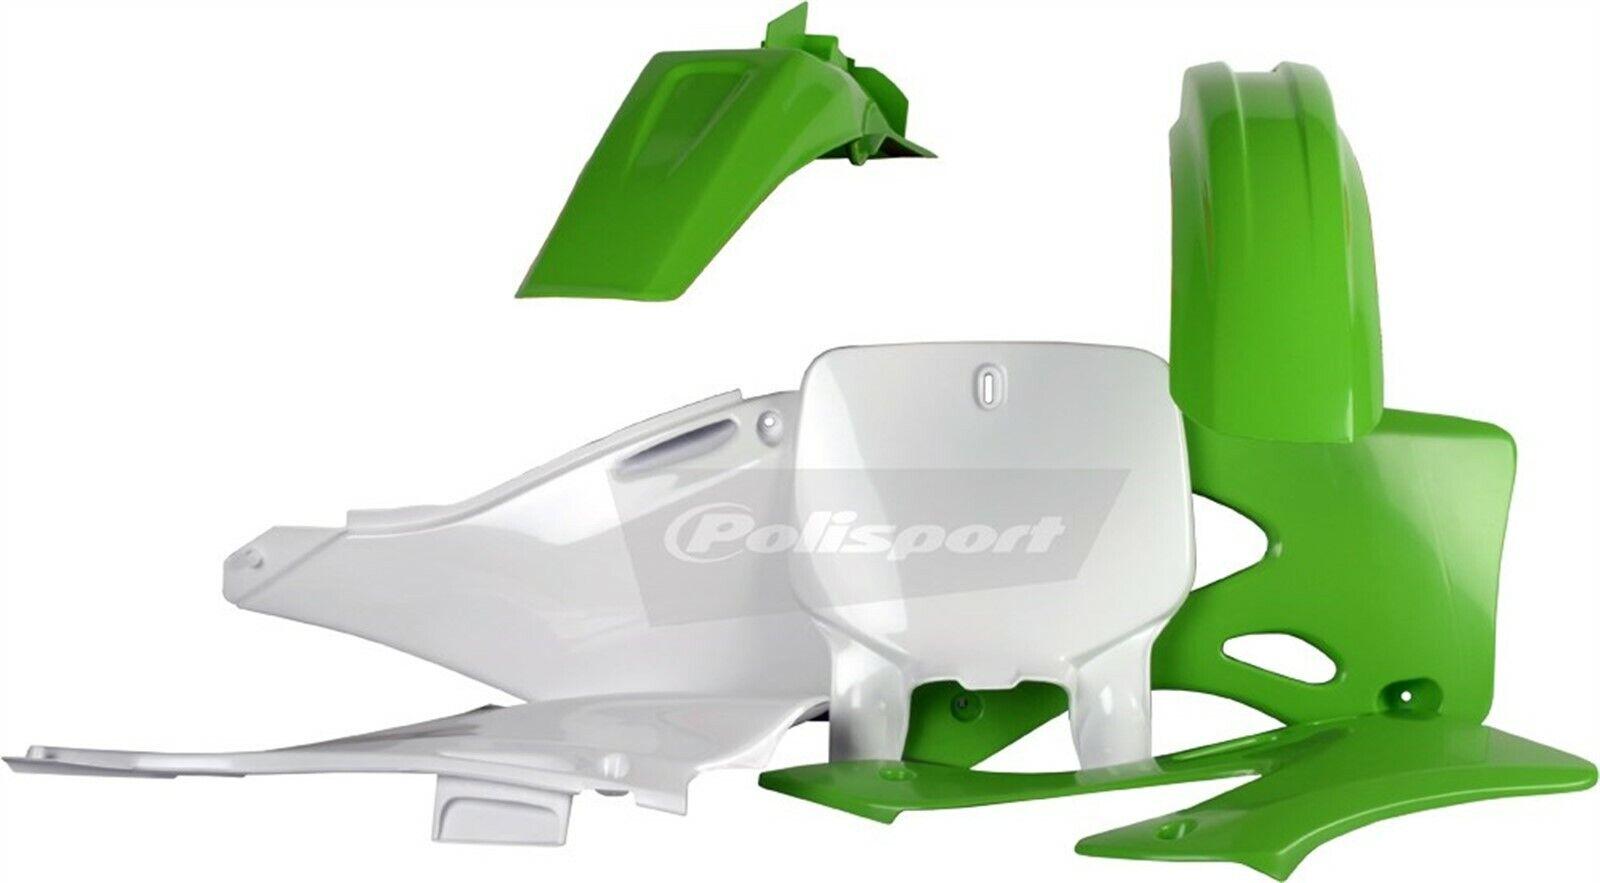 Color Green 90250 Polisport Plastic Kit OE